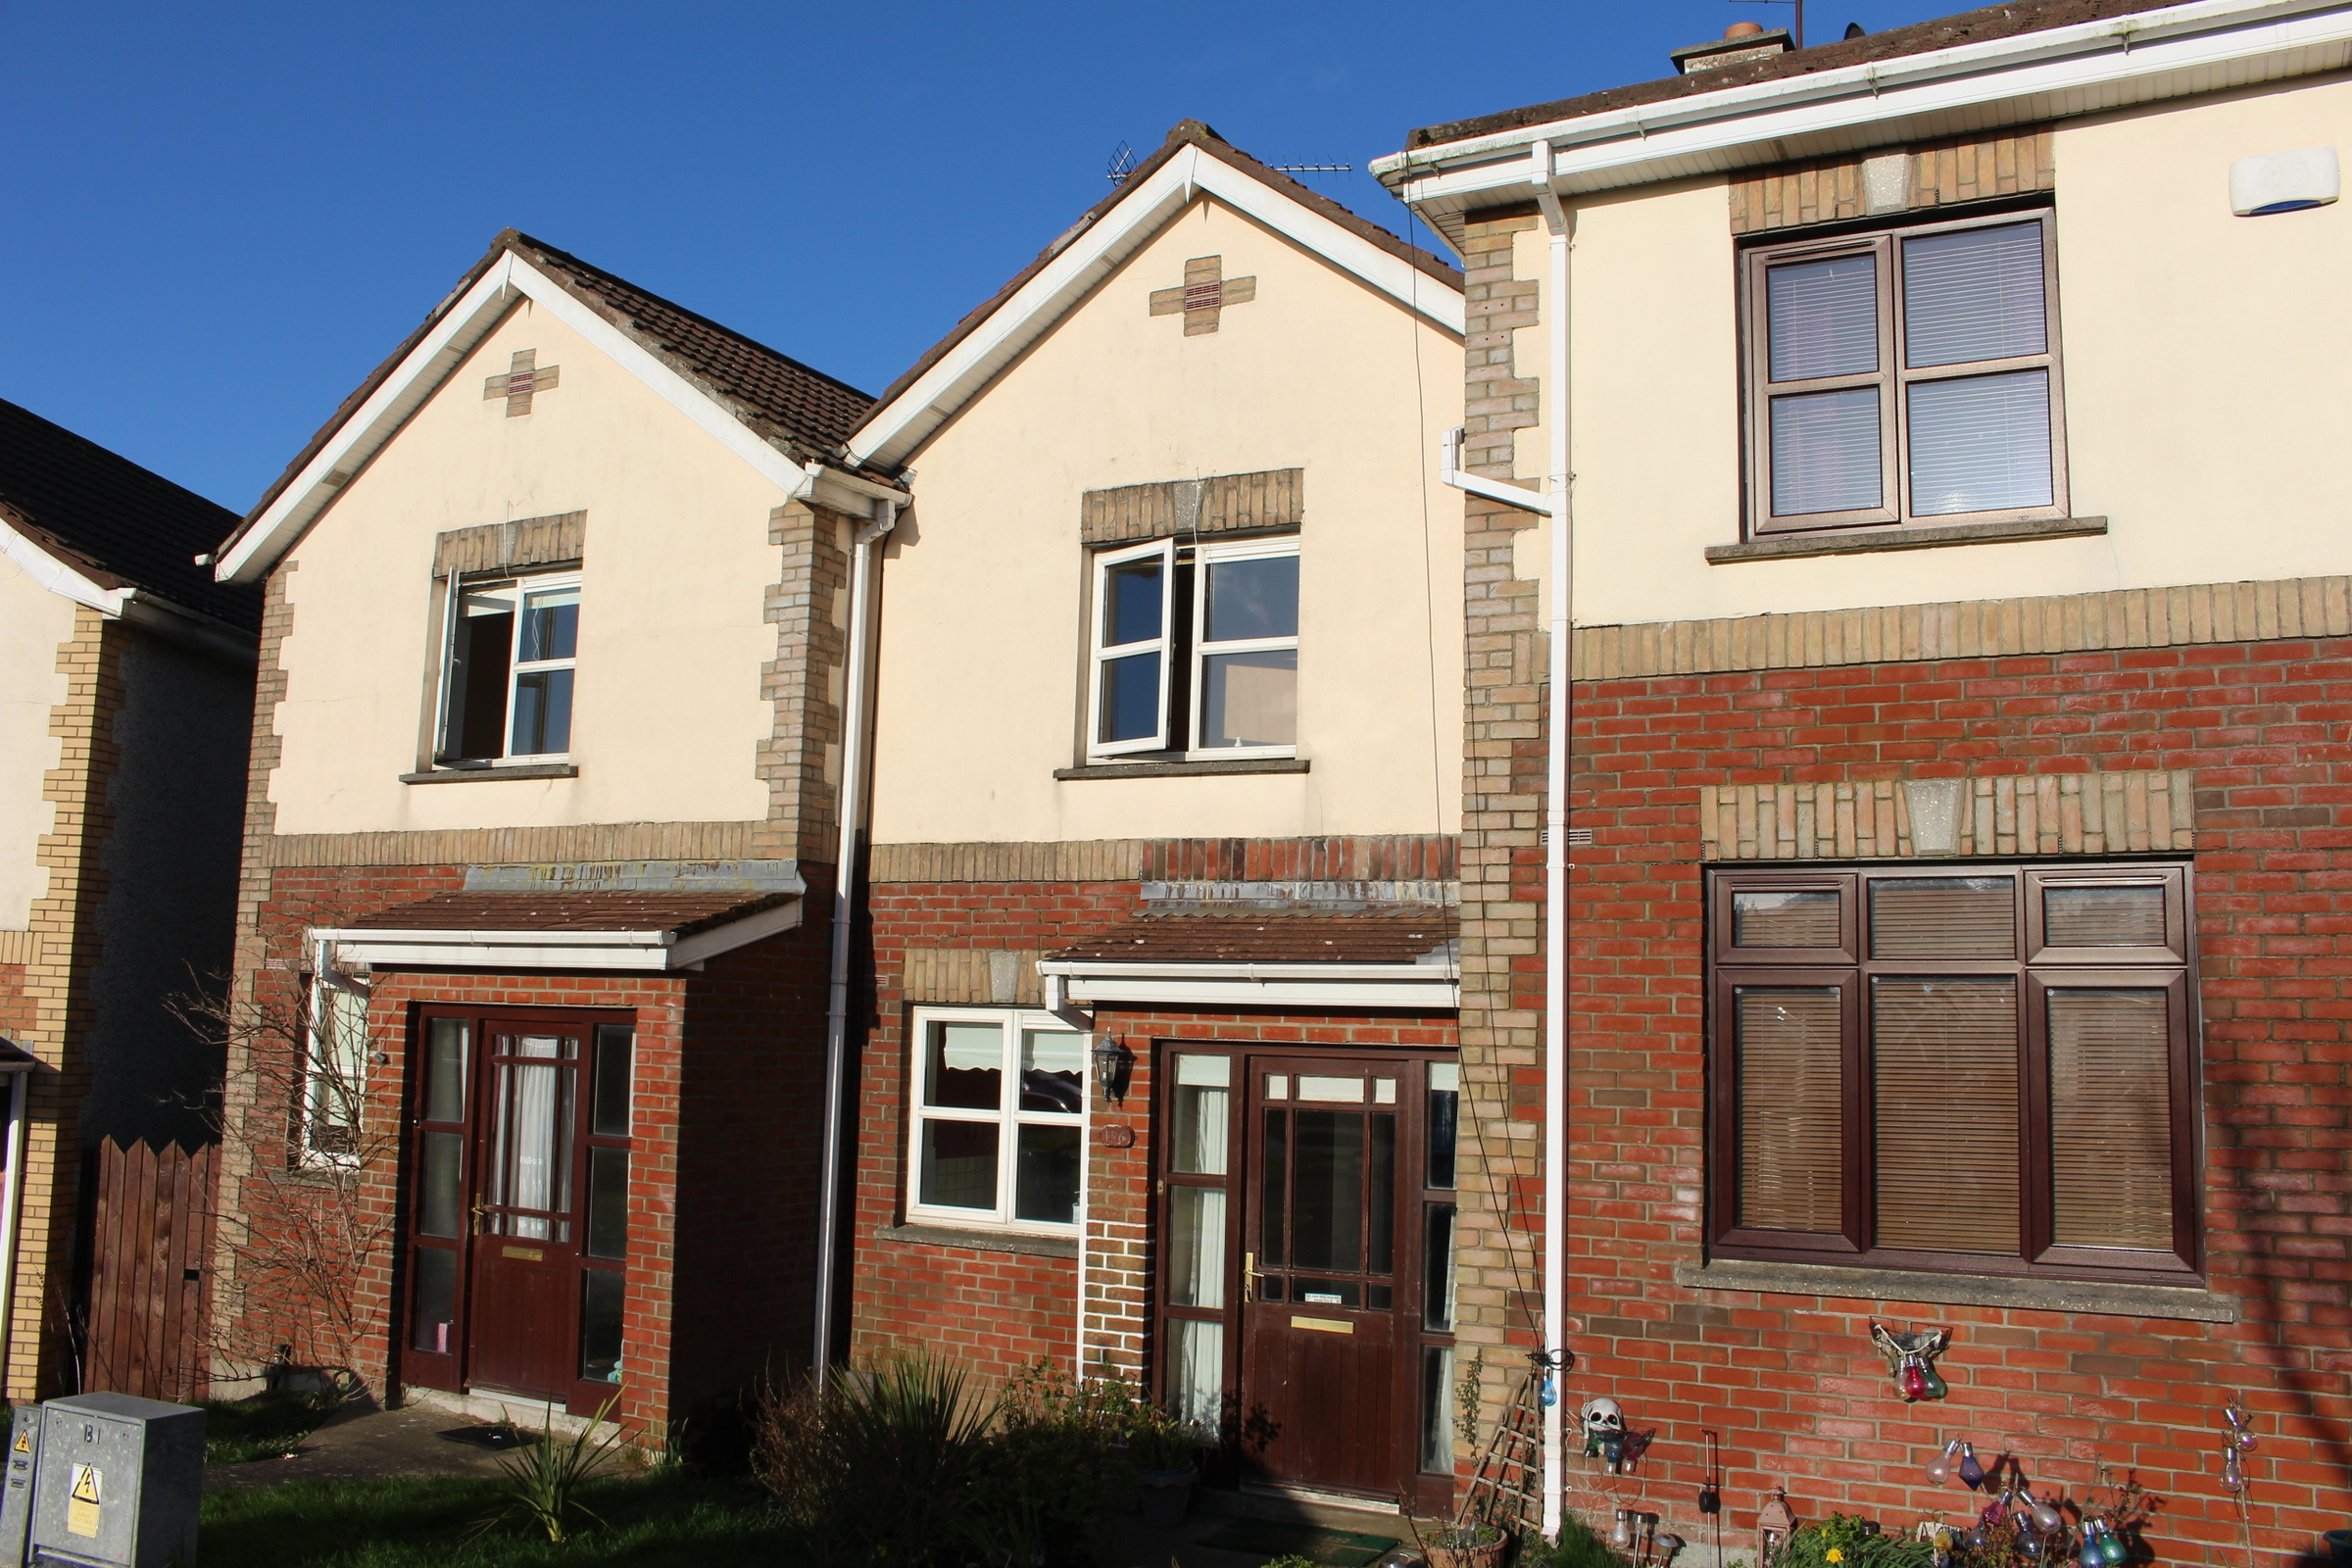 126 Newborough, Gorey, Co. Wexford